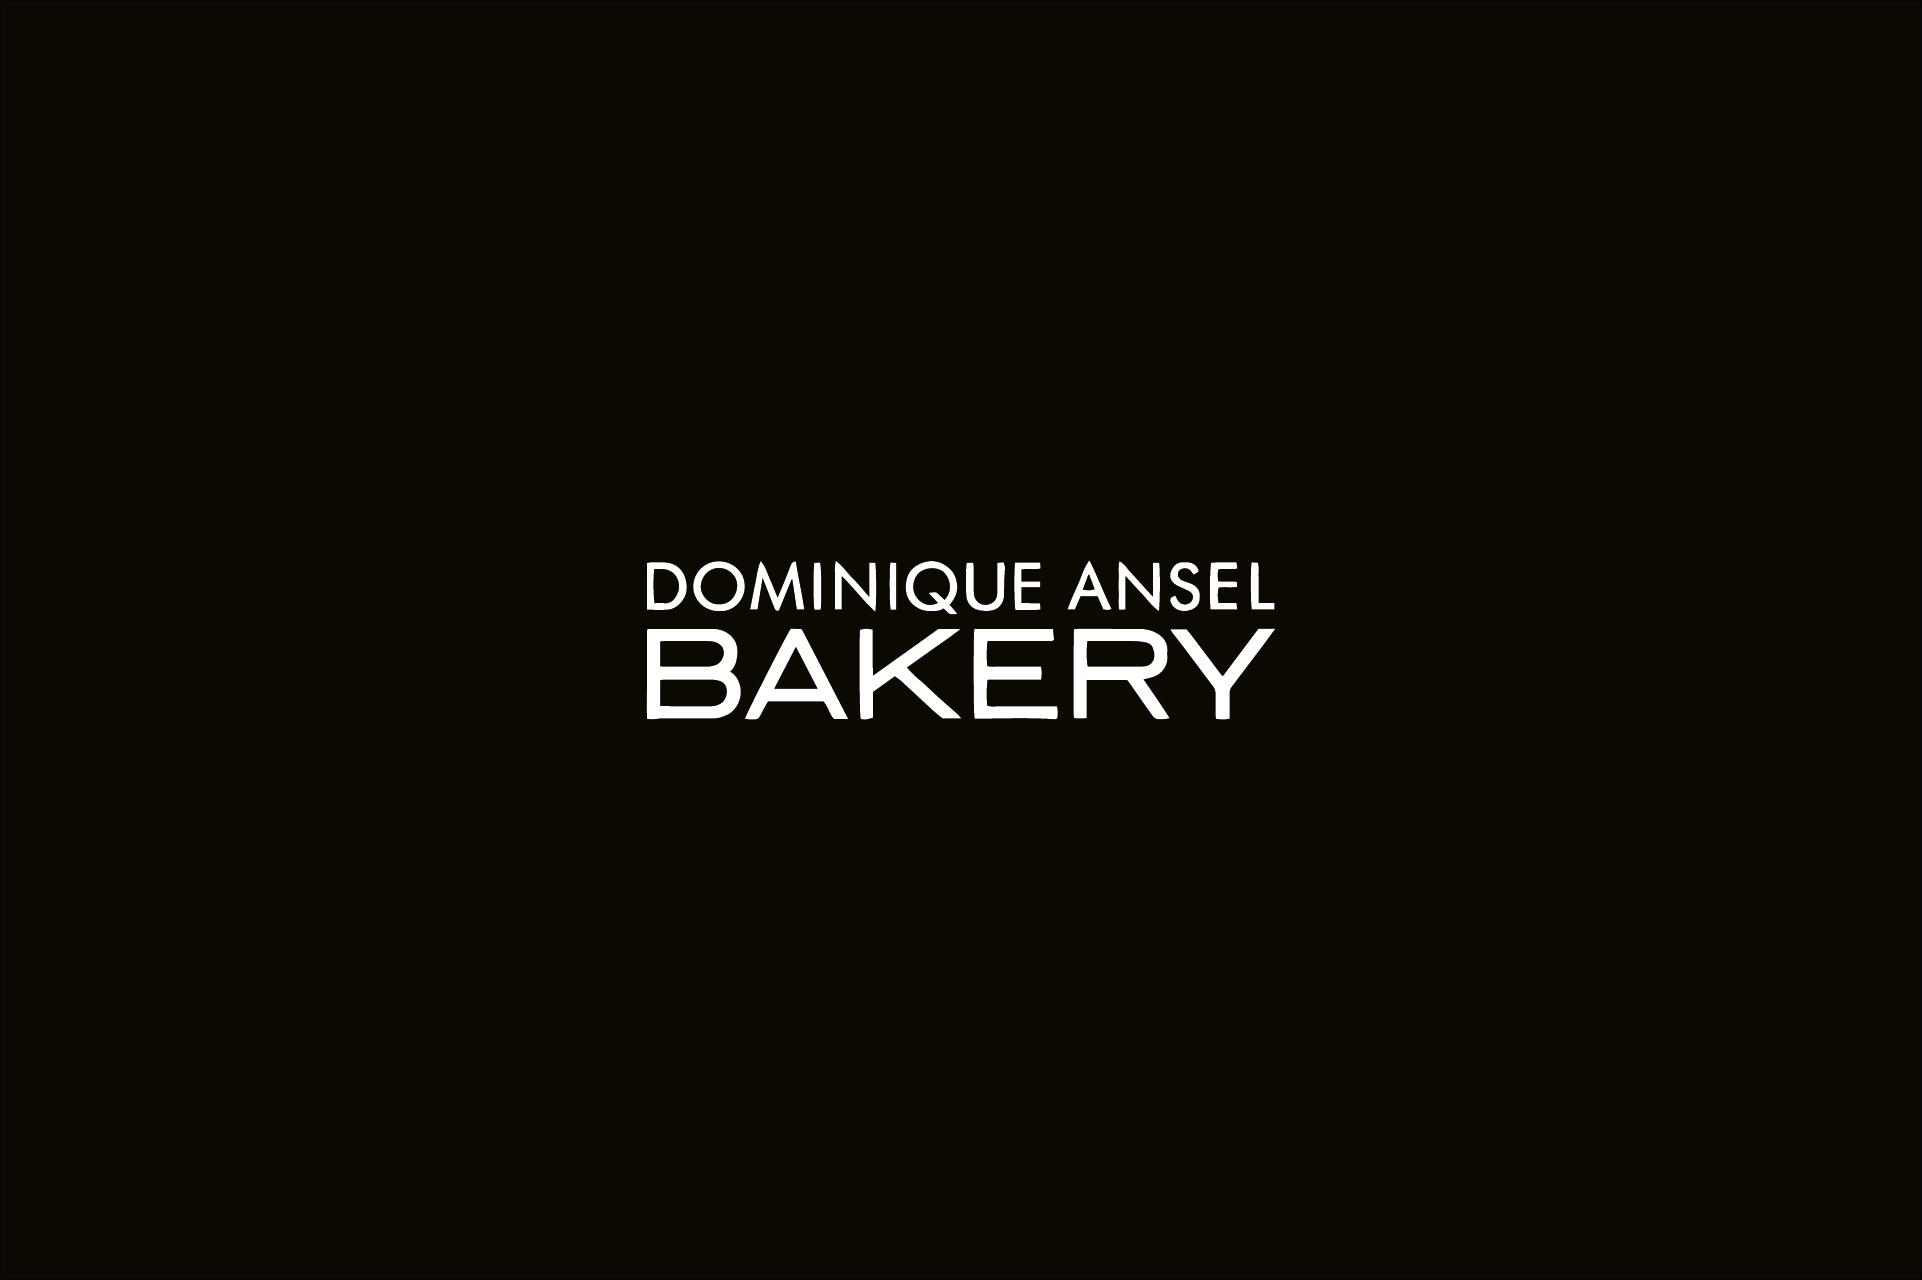 Dominique Ansel